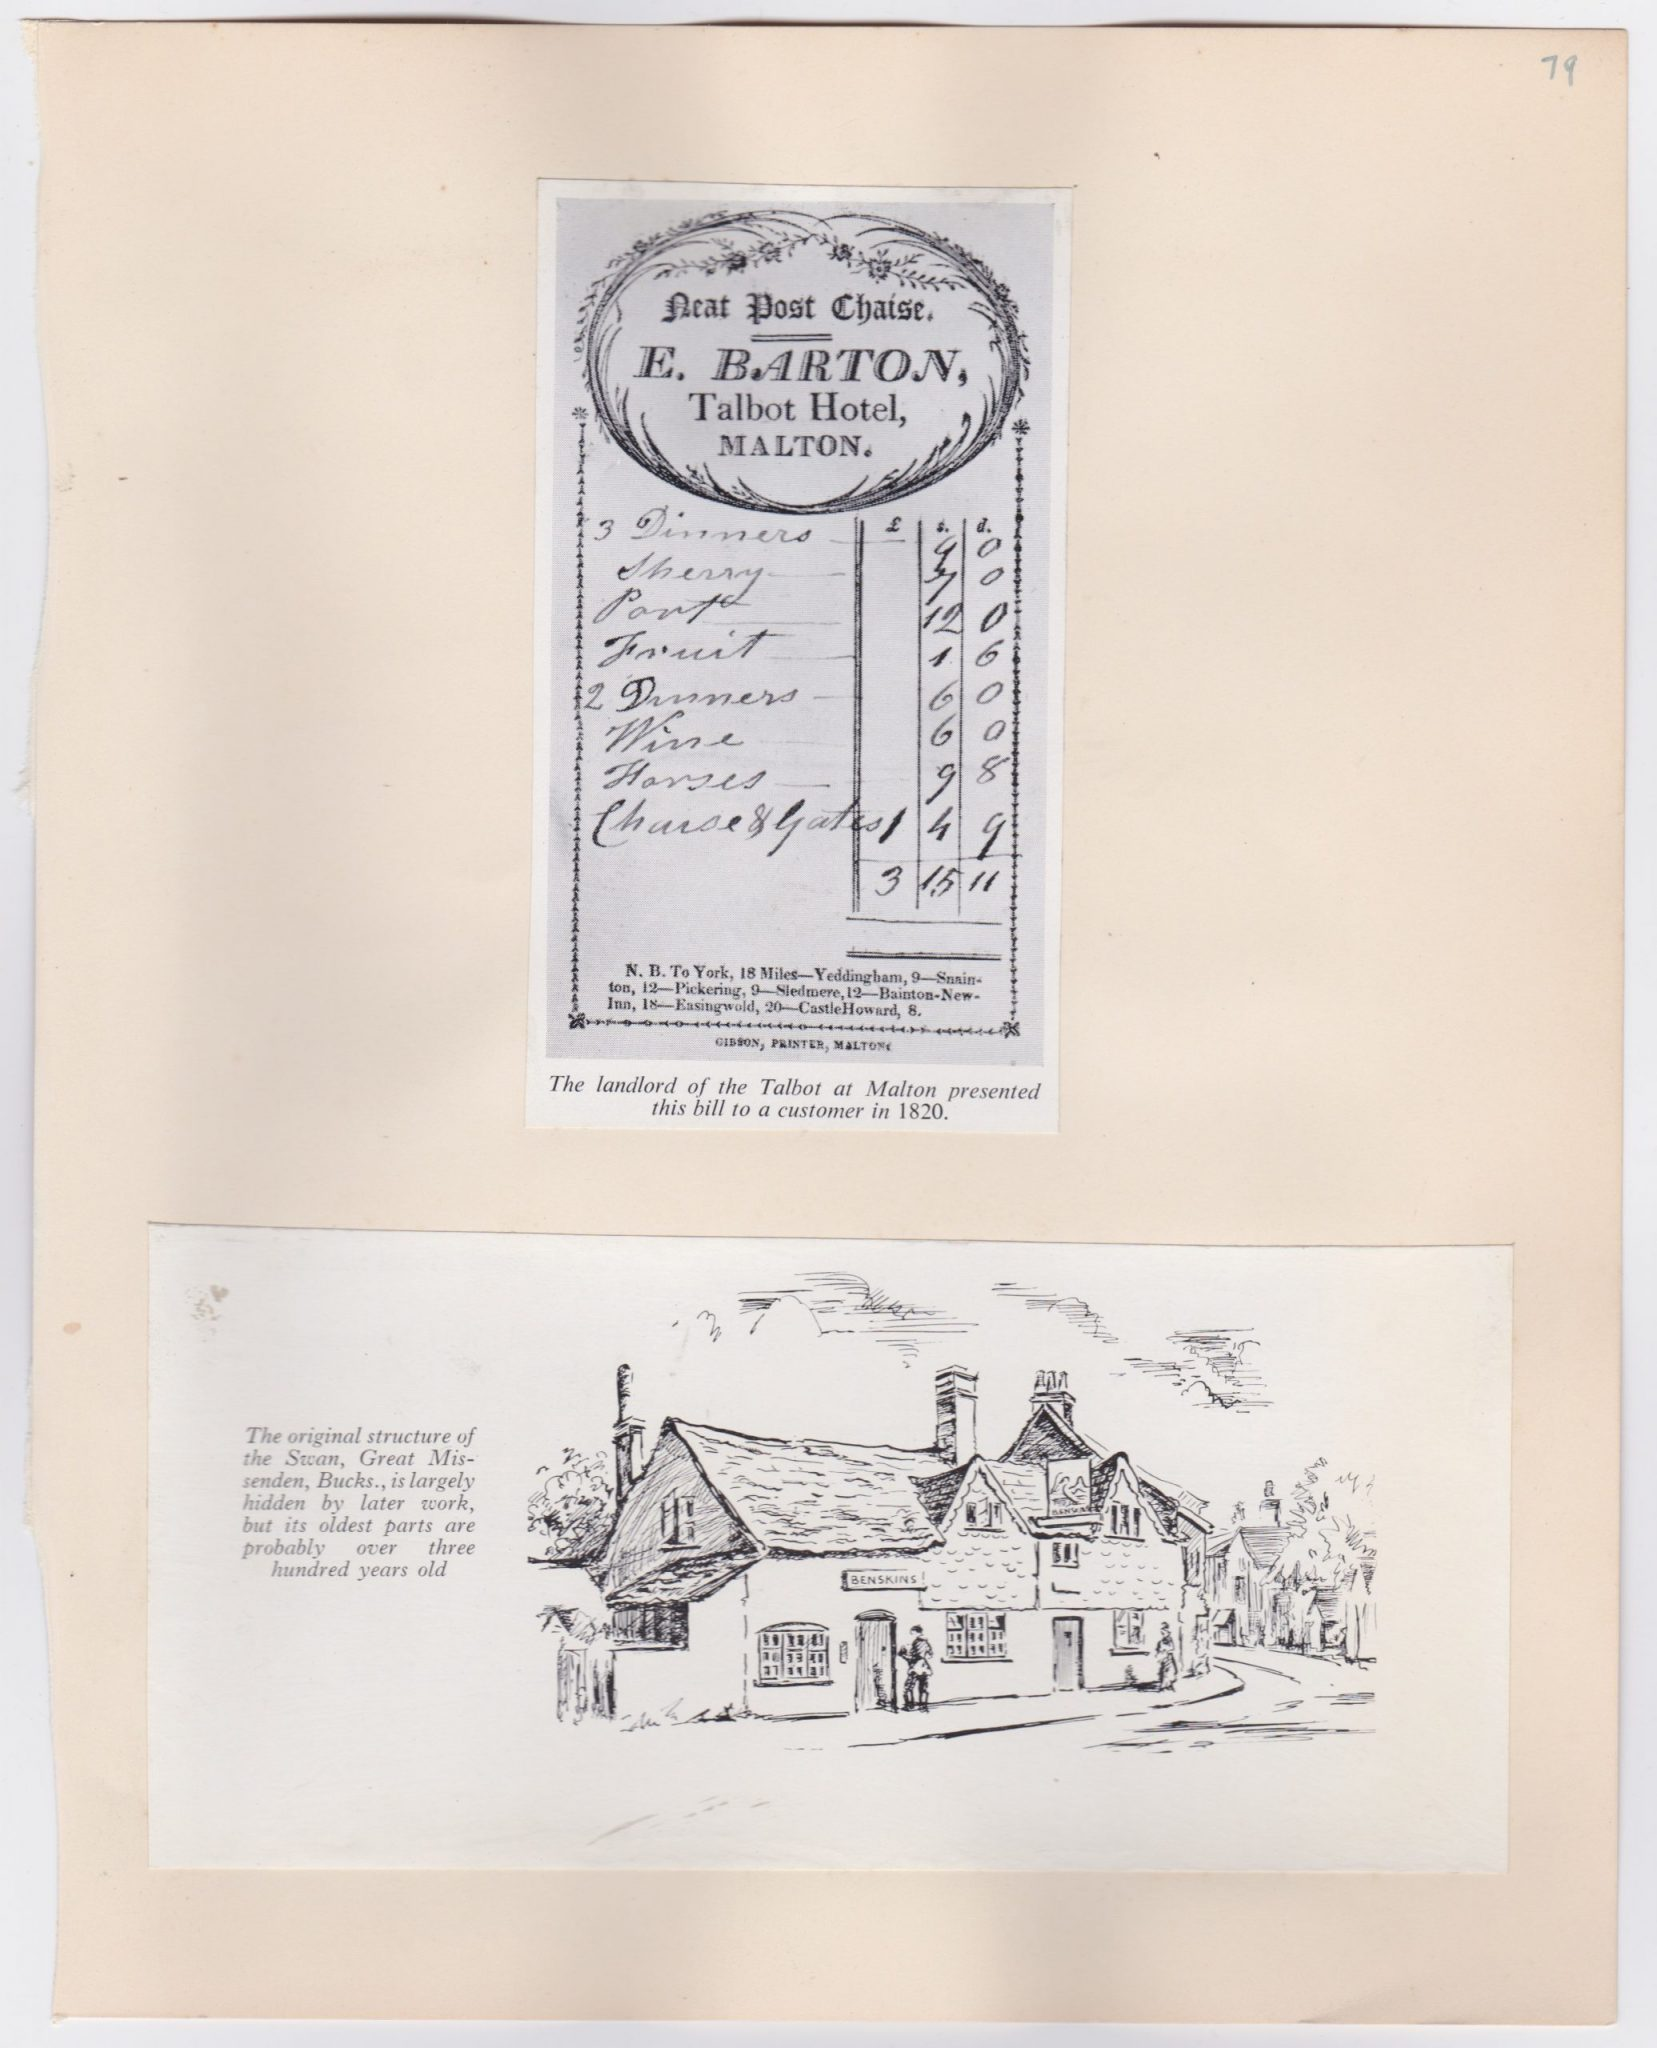 A Pub History Scrapbook Archive 29